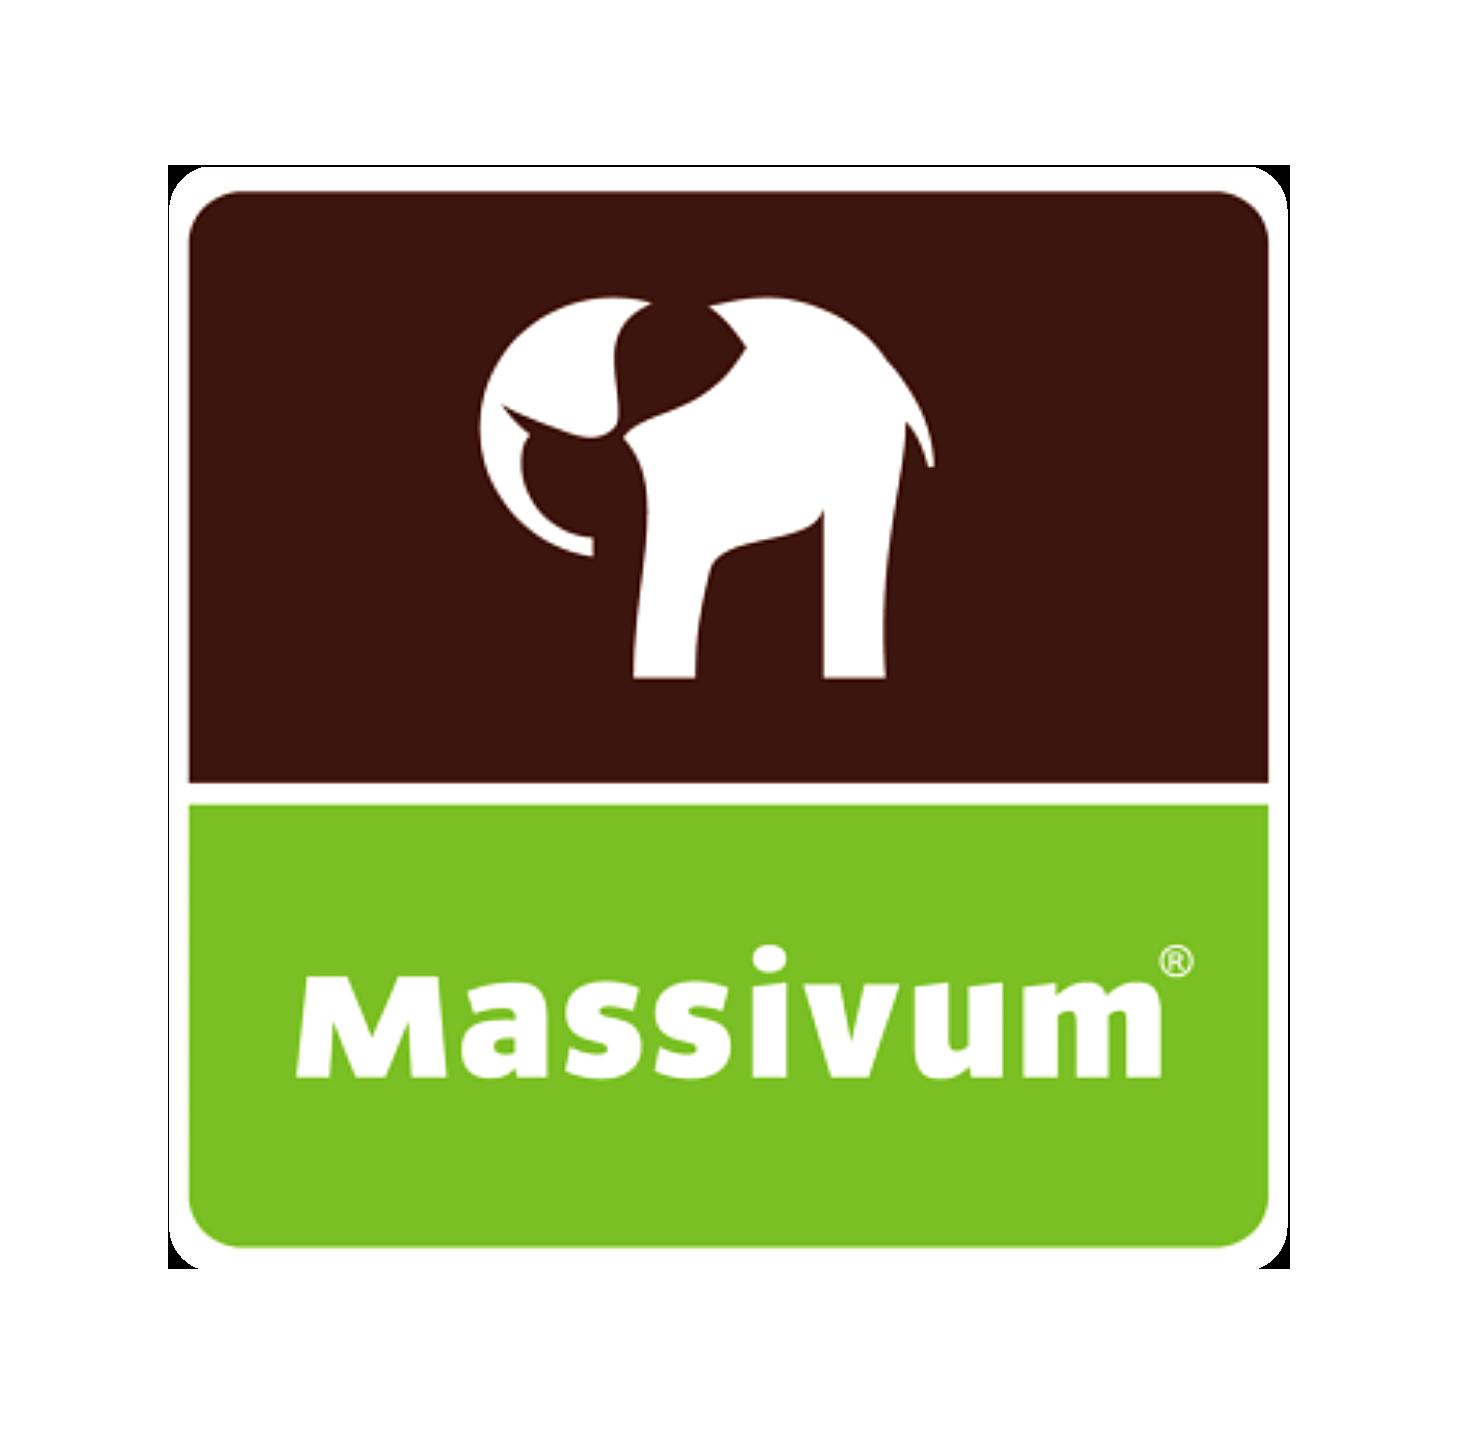 Massivum